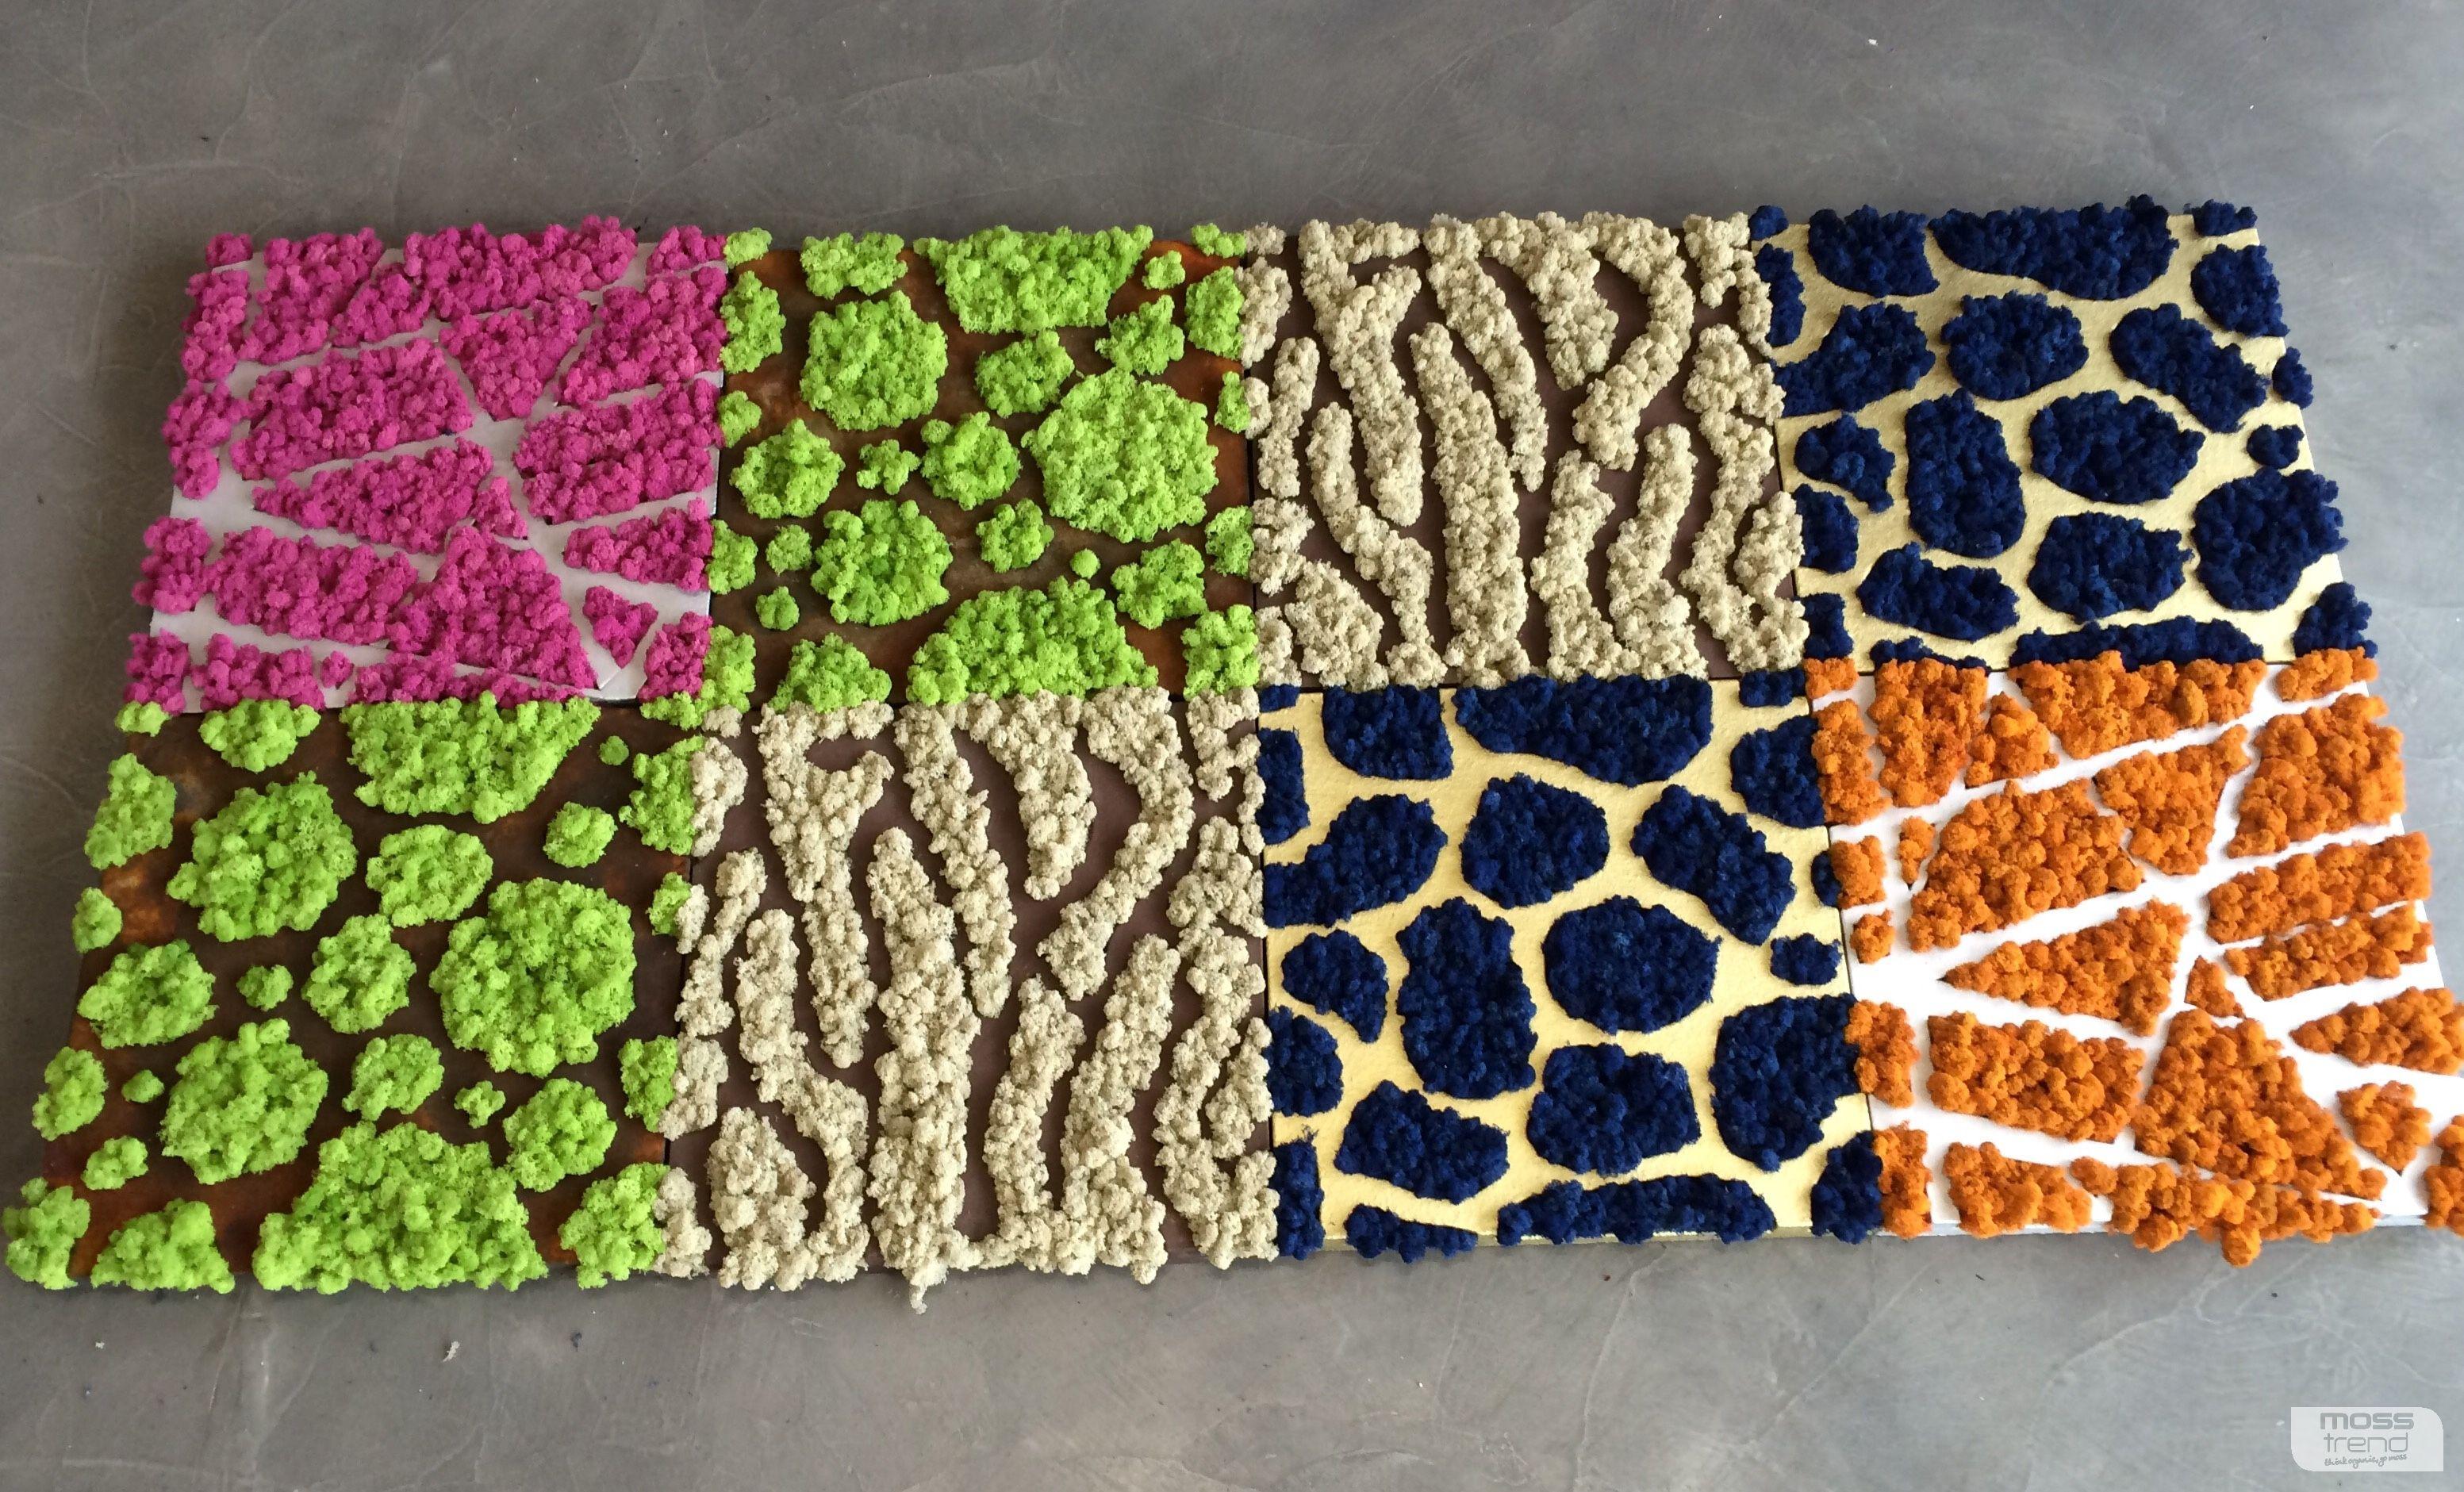 Pareti Verdi Verticali Costi lichene stabilizzato pannelli lichene stabilizzato sfuso